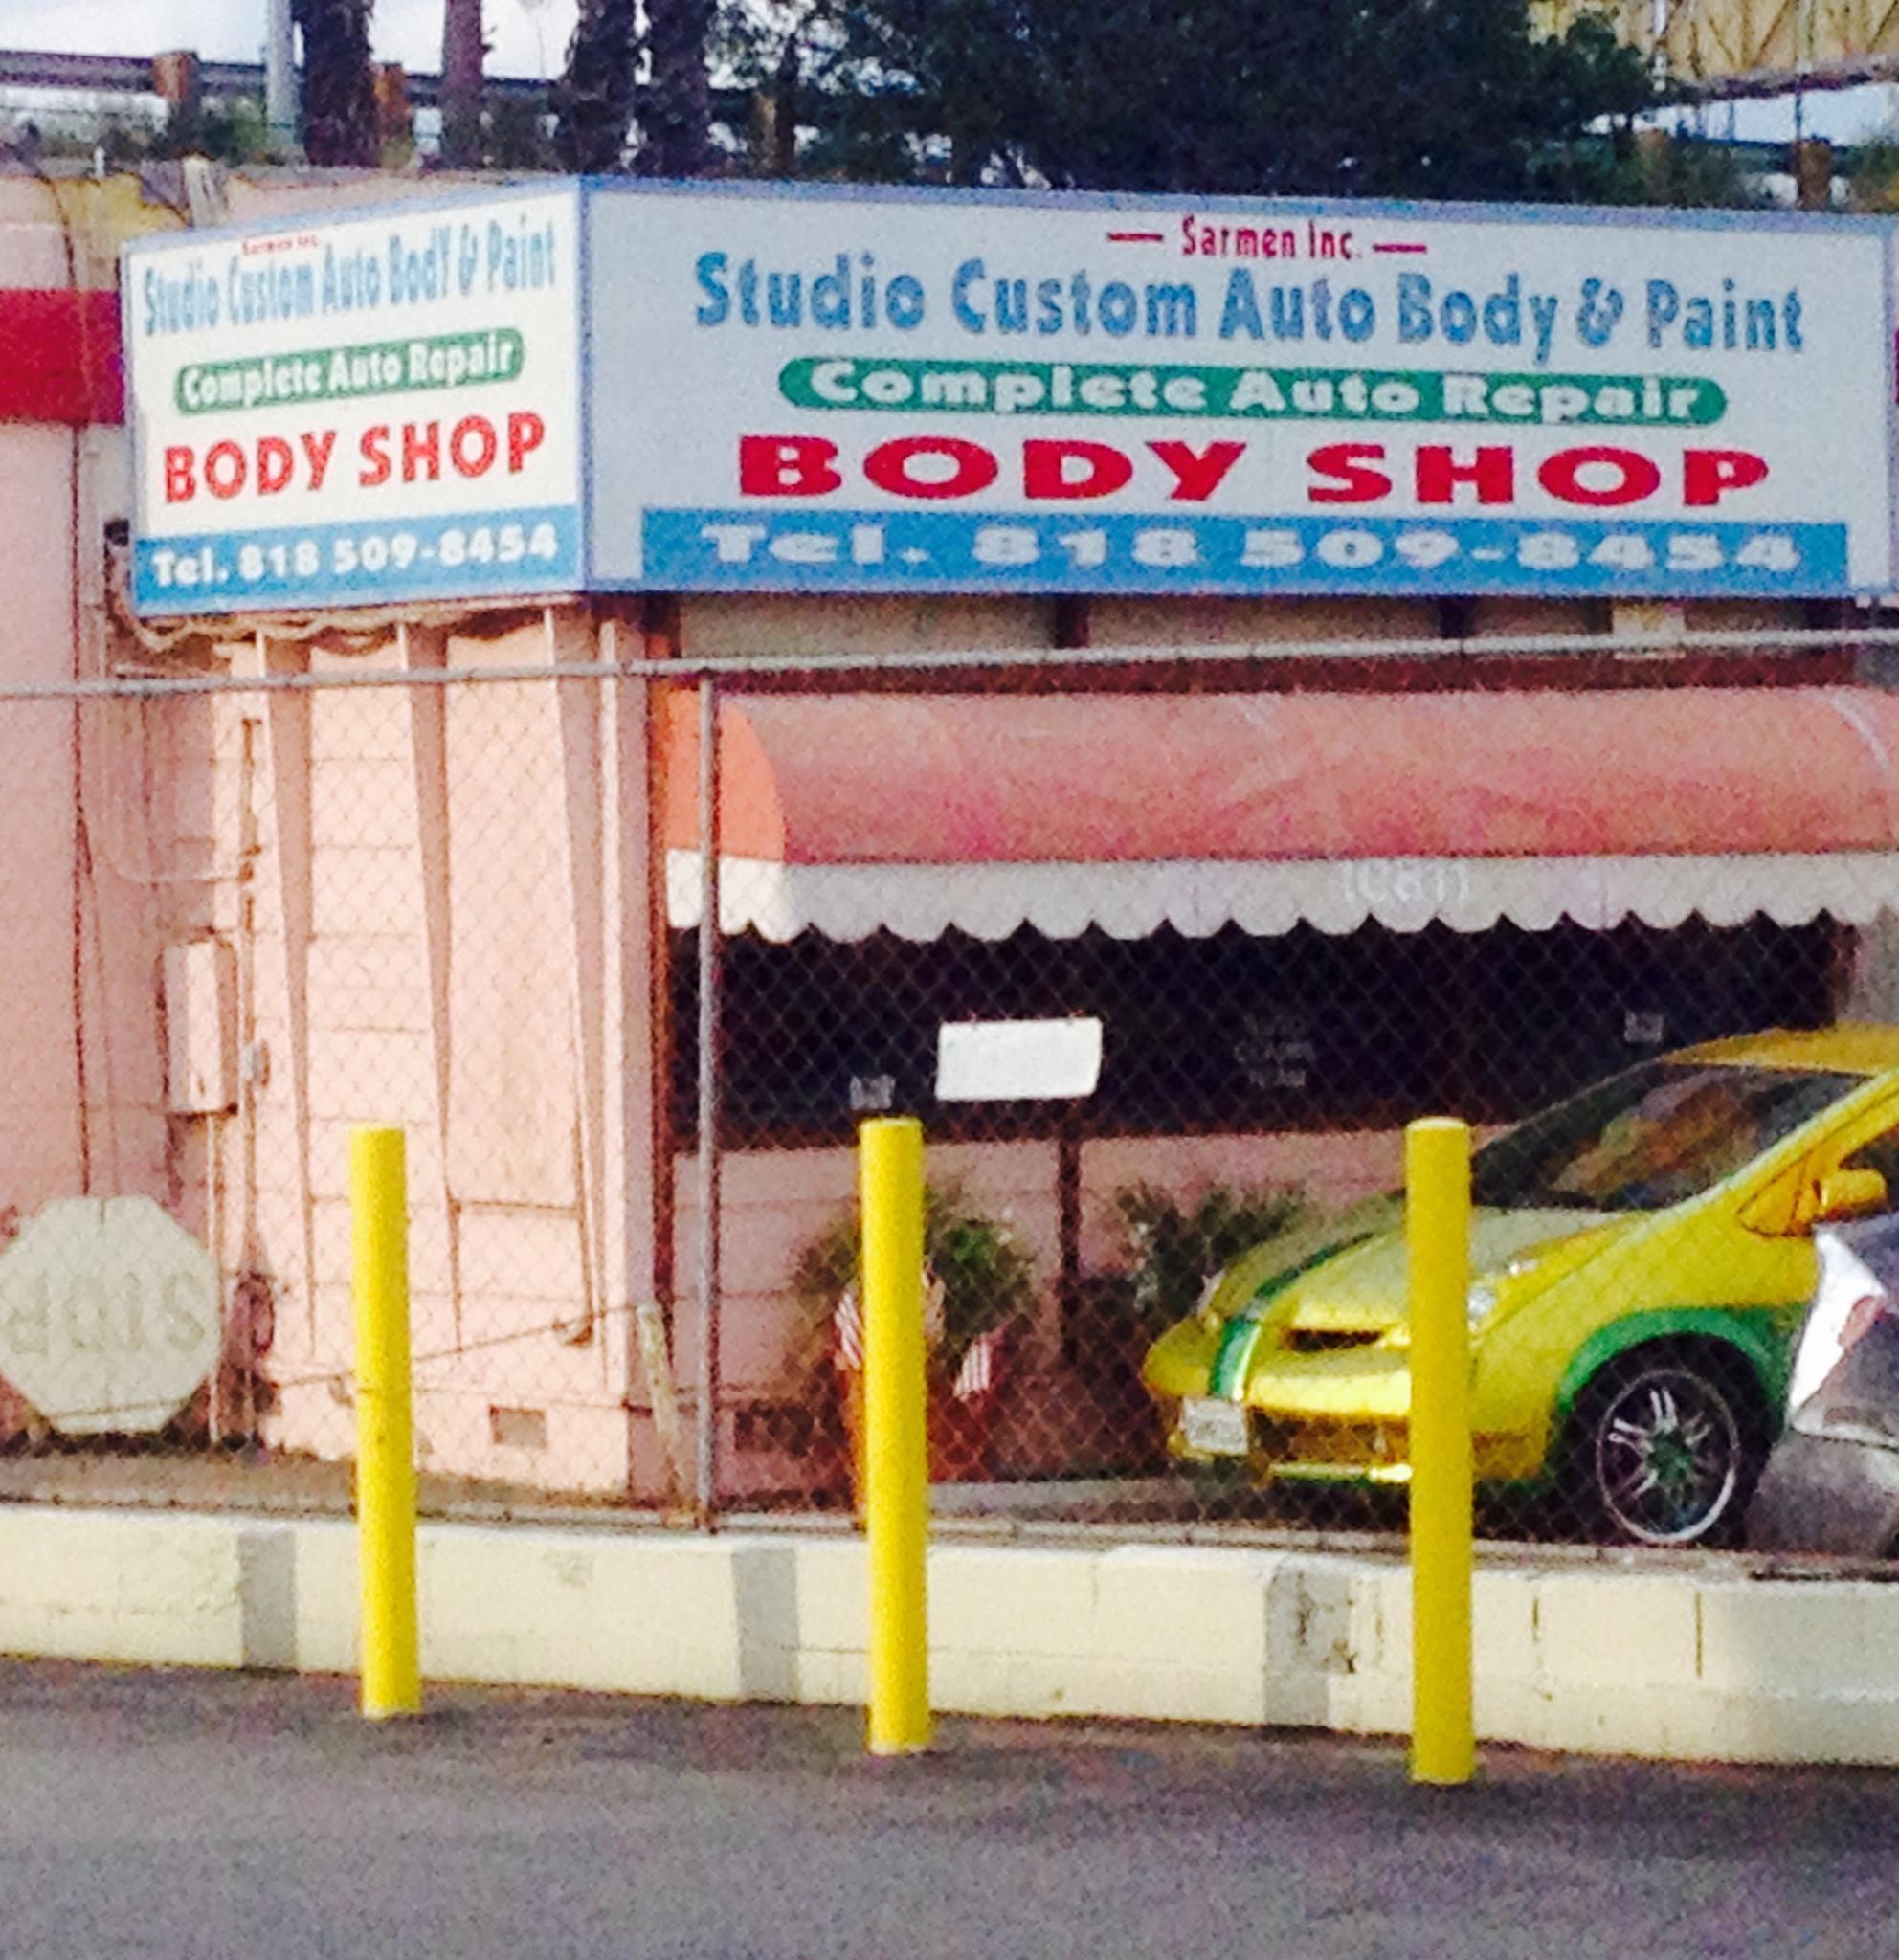 Studio Custom Auto Body & Paint 10811 Riverside Dr, North Hollywood